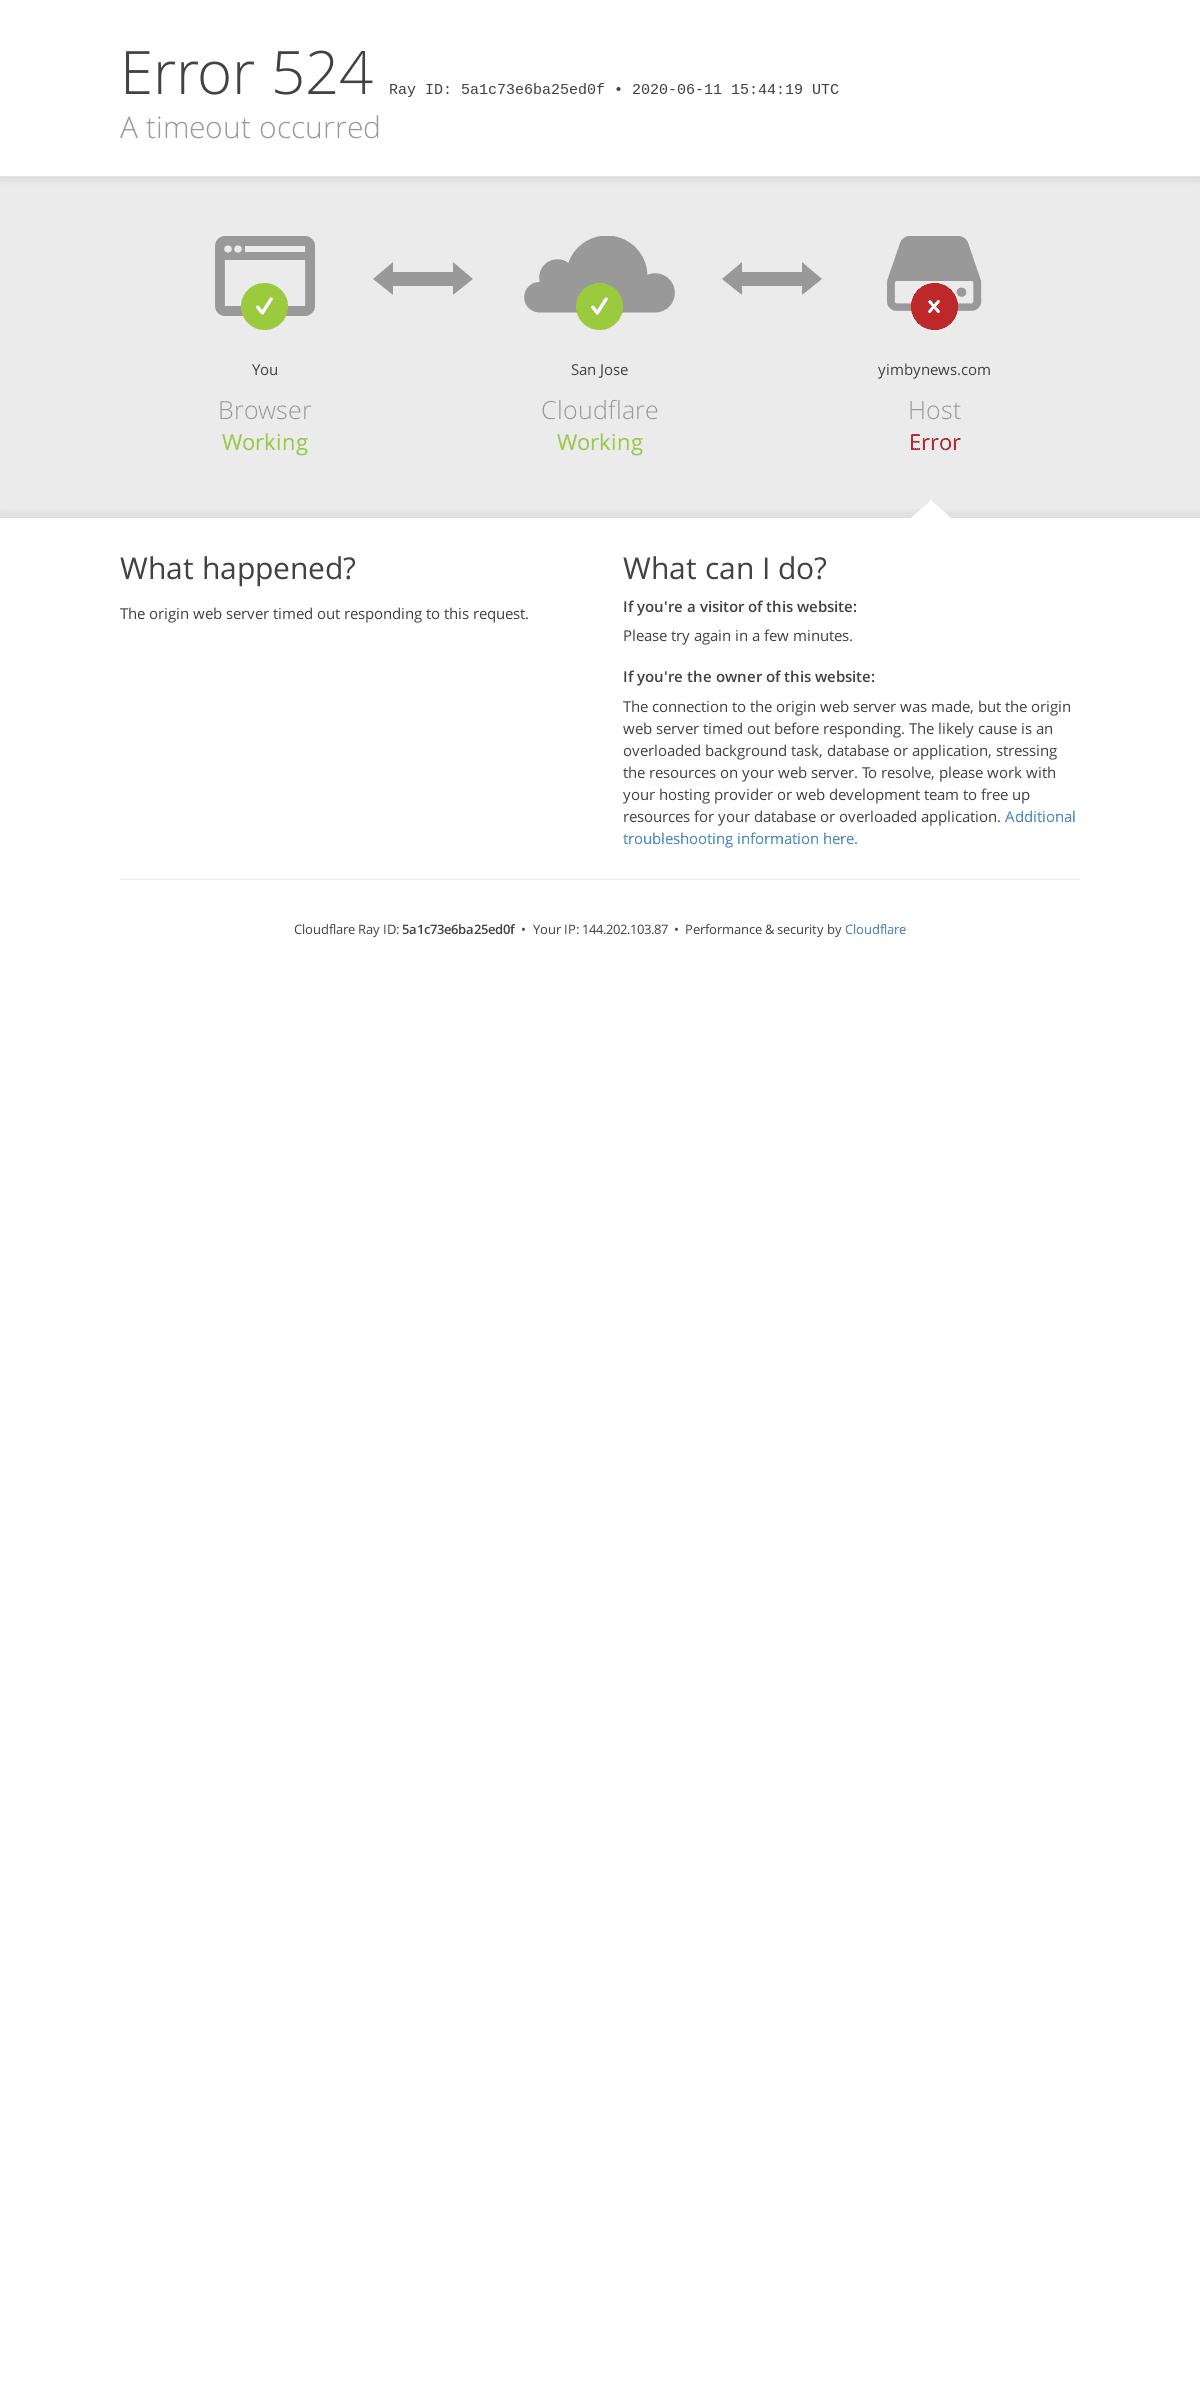 yimbynews.com - 524- A timeout occurred